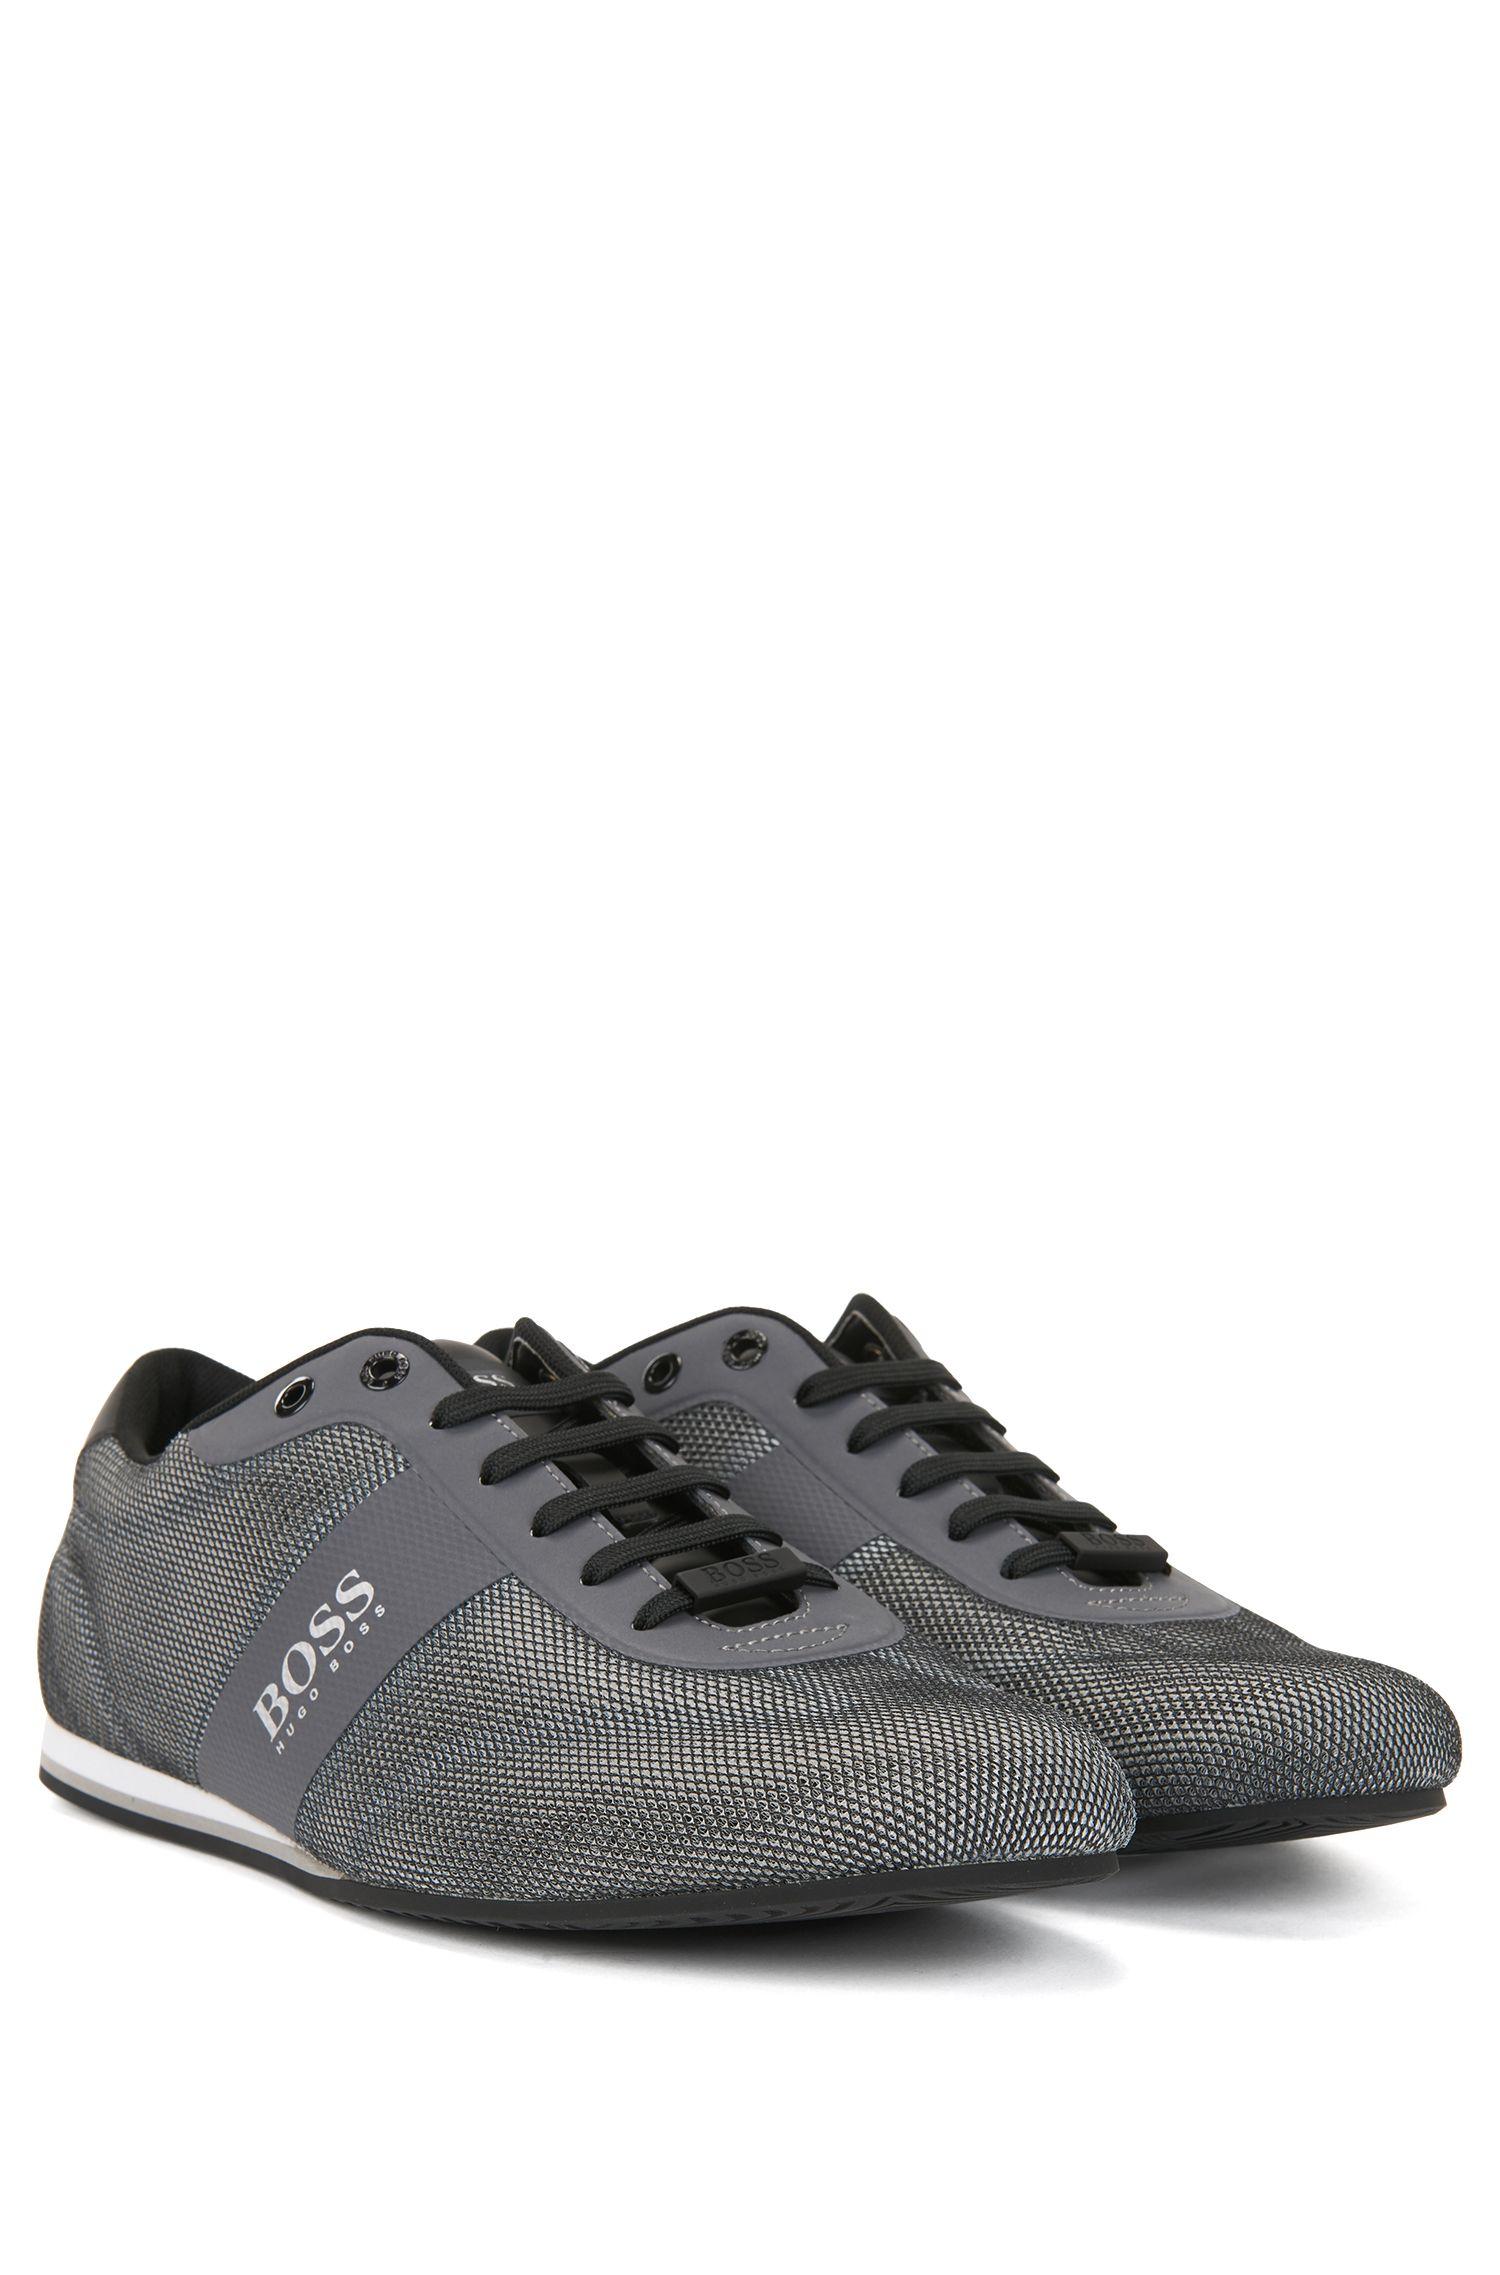 BOSS Hugo Boss Low-top sneakers one-piece mesh uppers 11 Grey